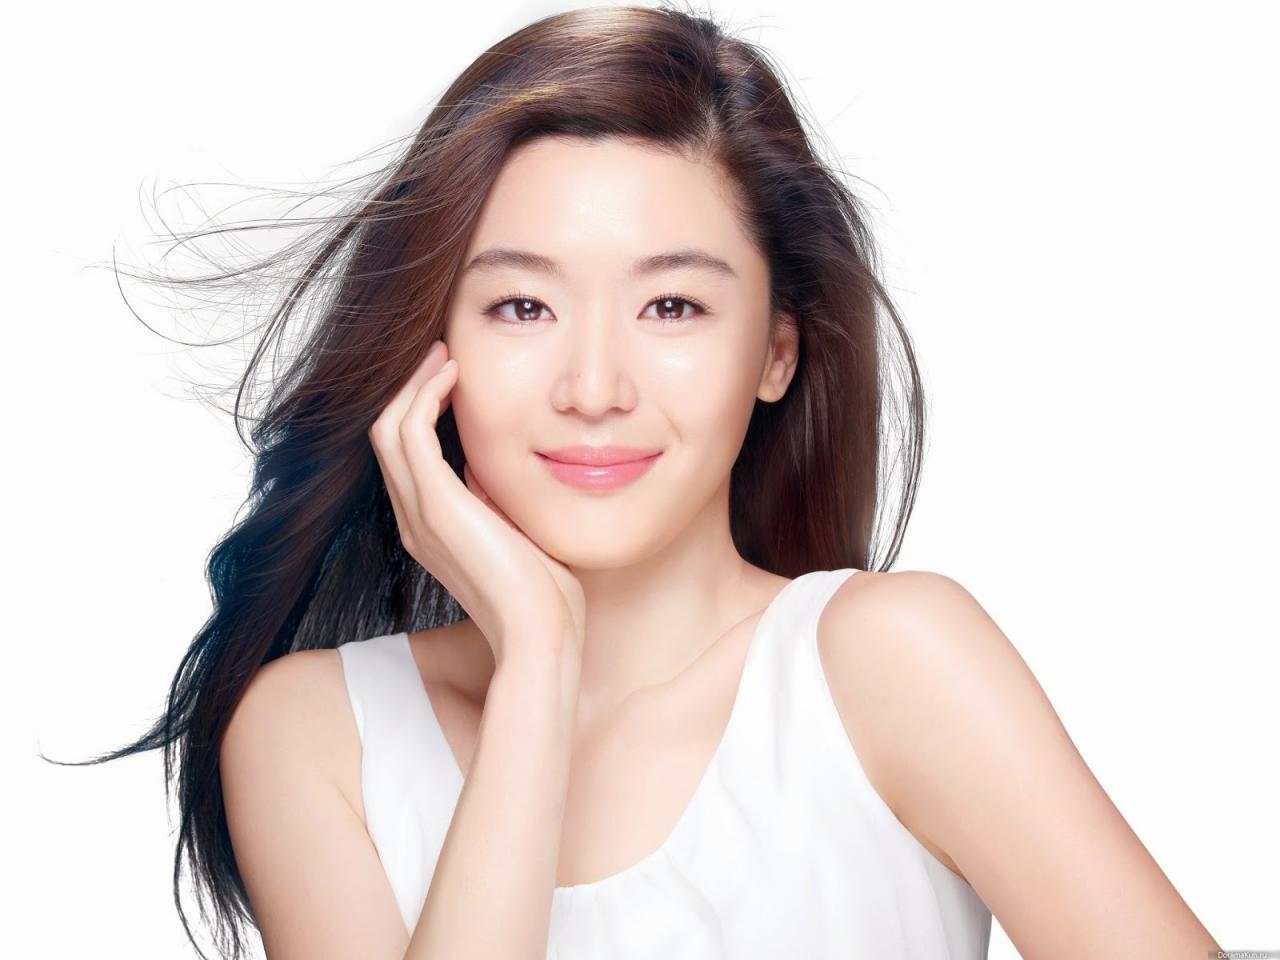 модели азиатской внешности москва